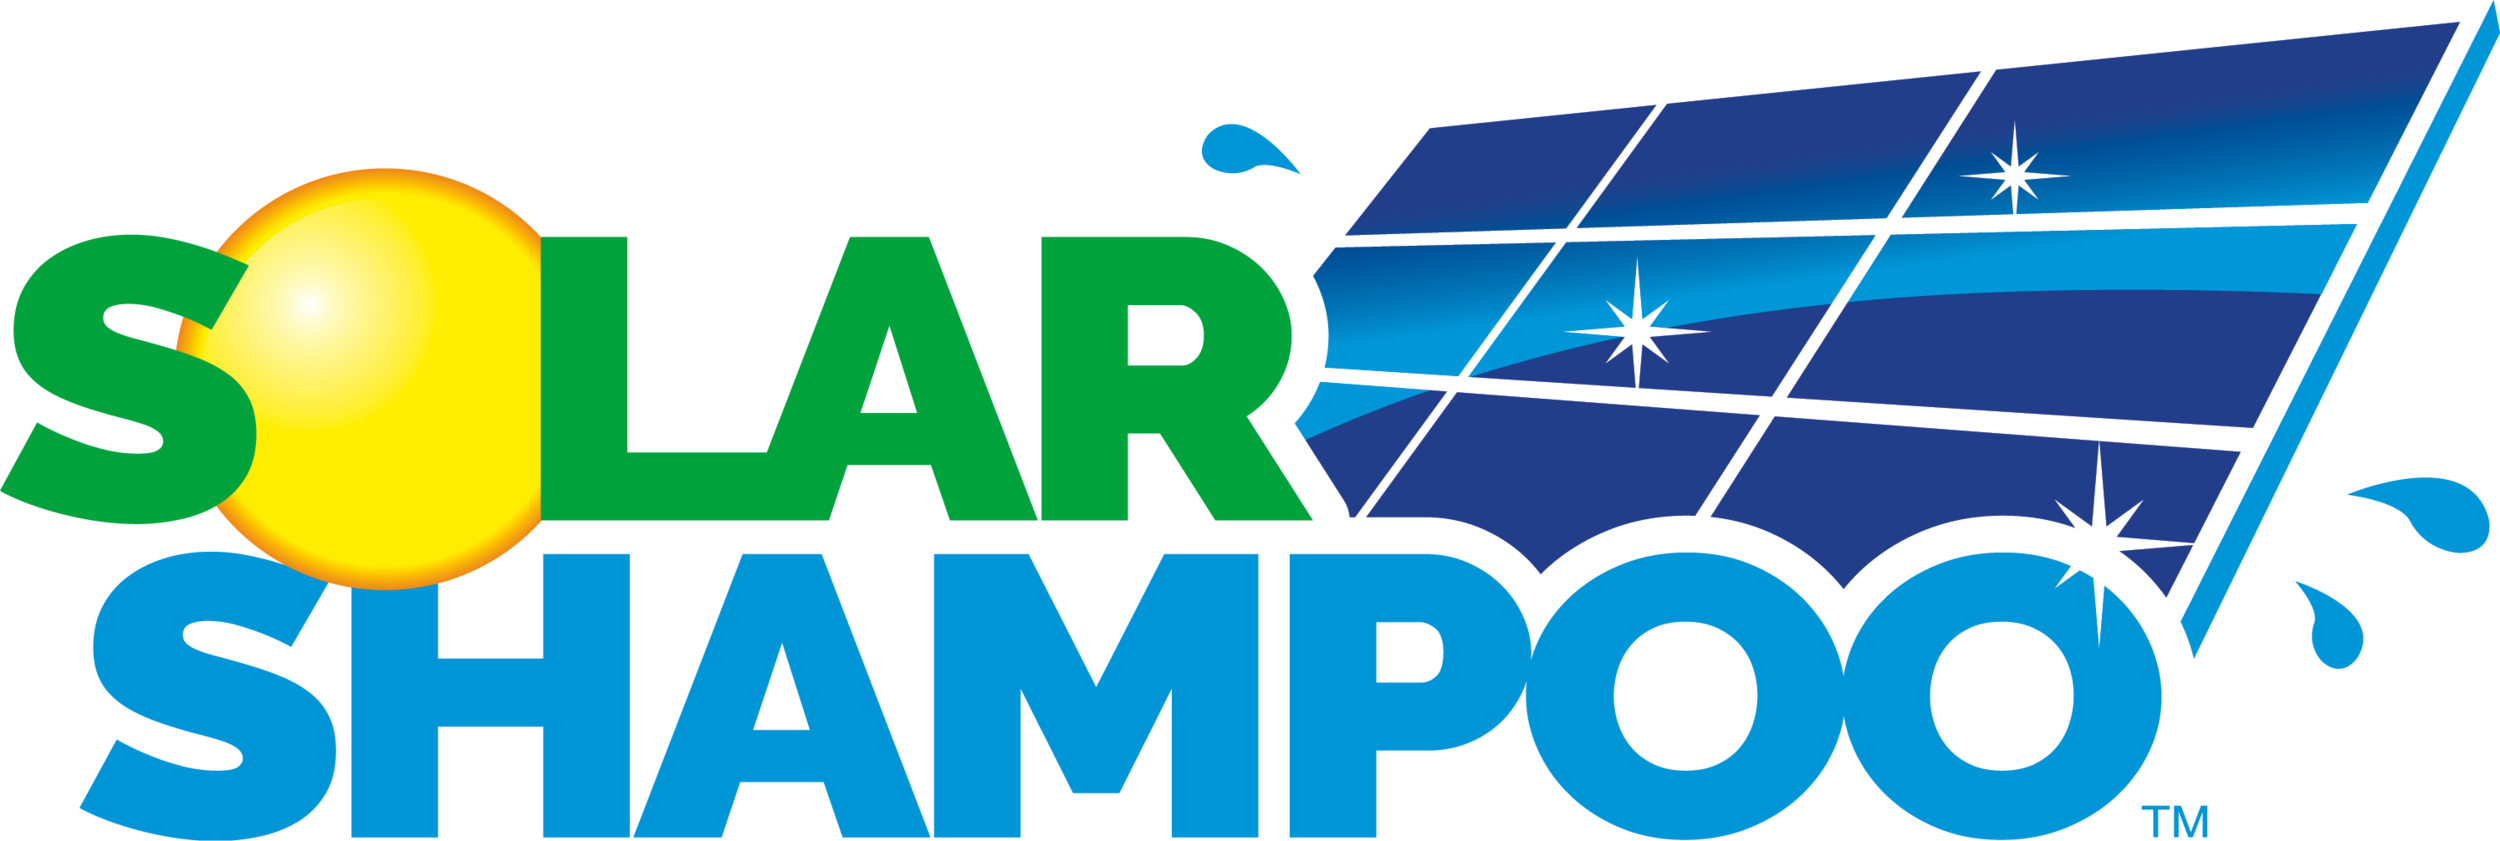 SolarShampoo-LOGO3-png-LG.png